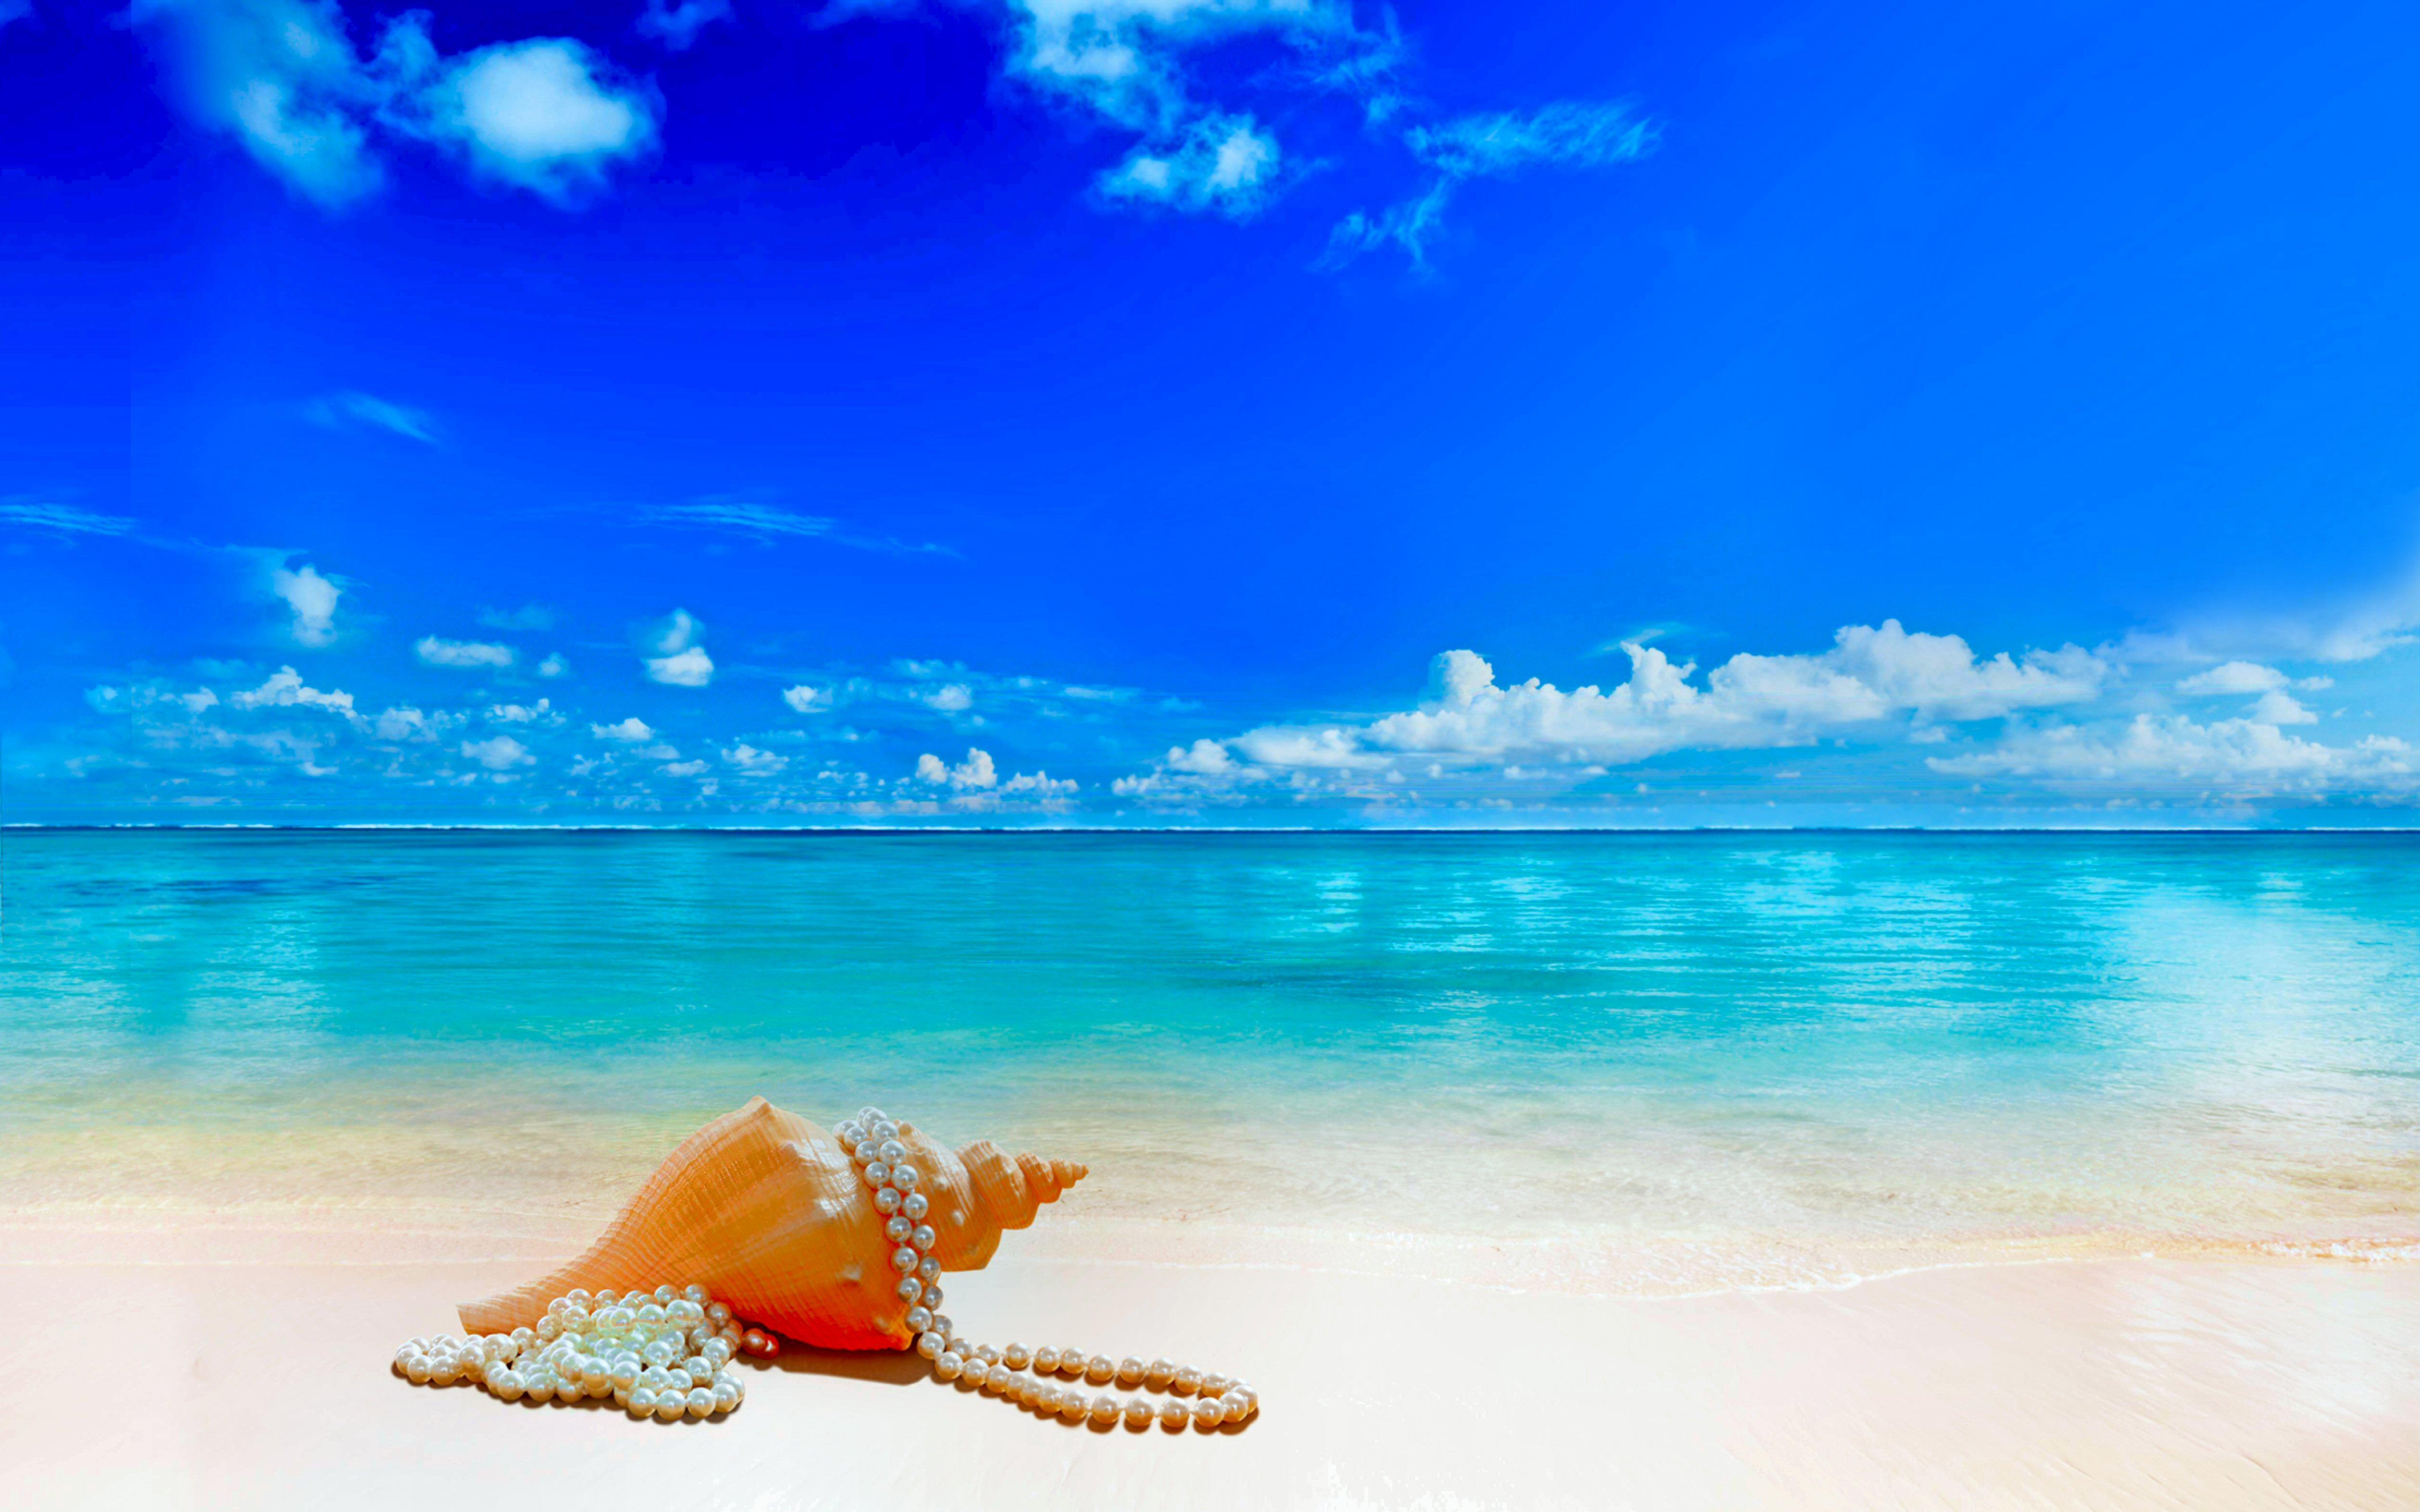 tropical beach wallpapers hd | Beach | Pinterest | Tropical ...